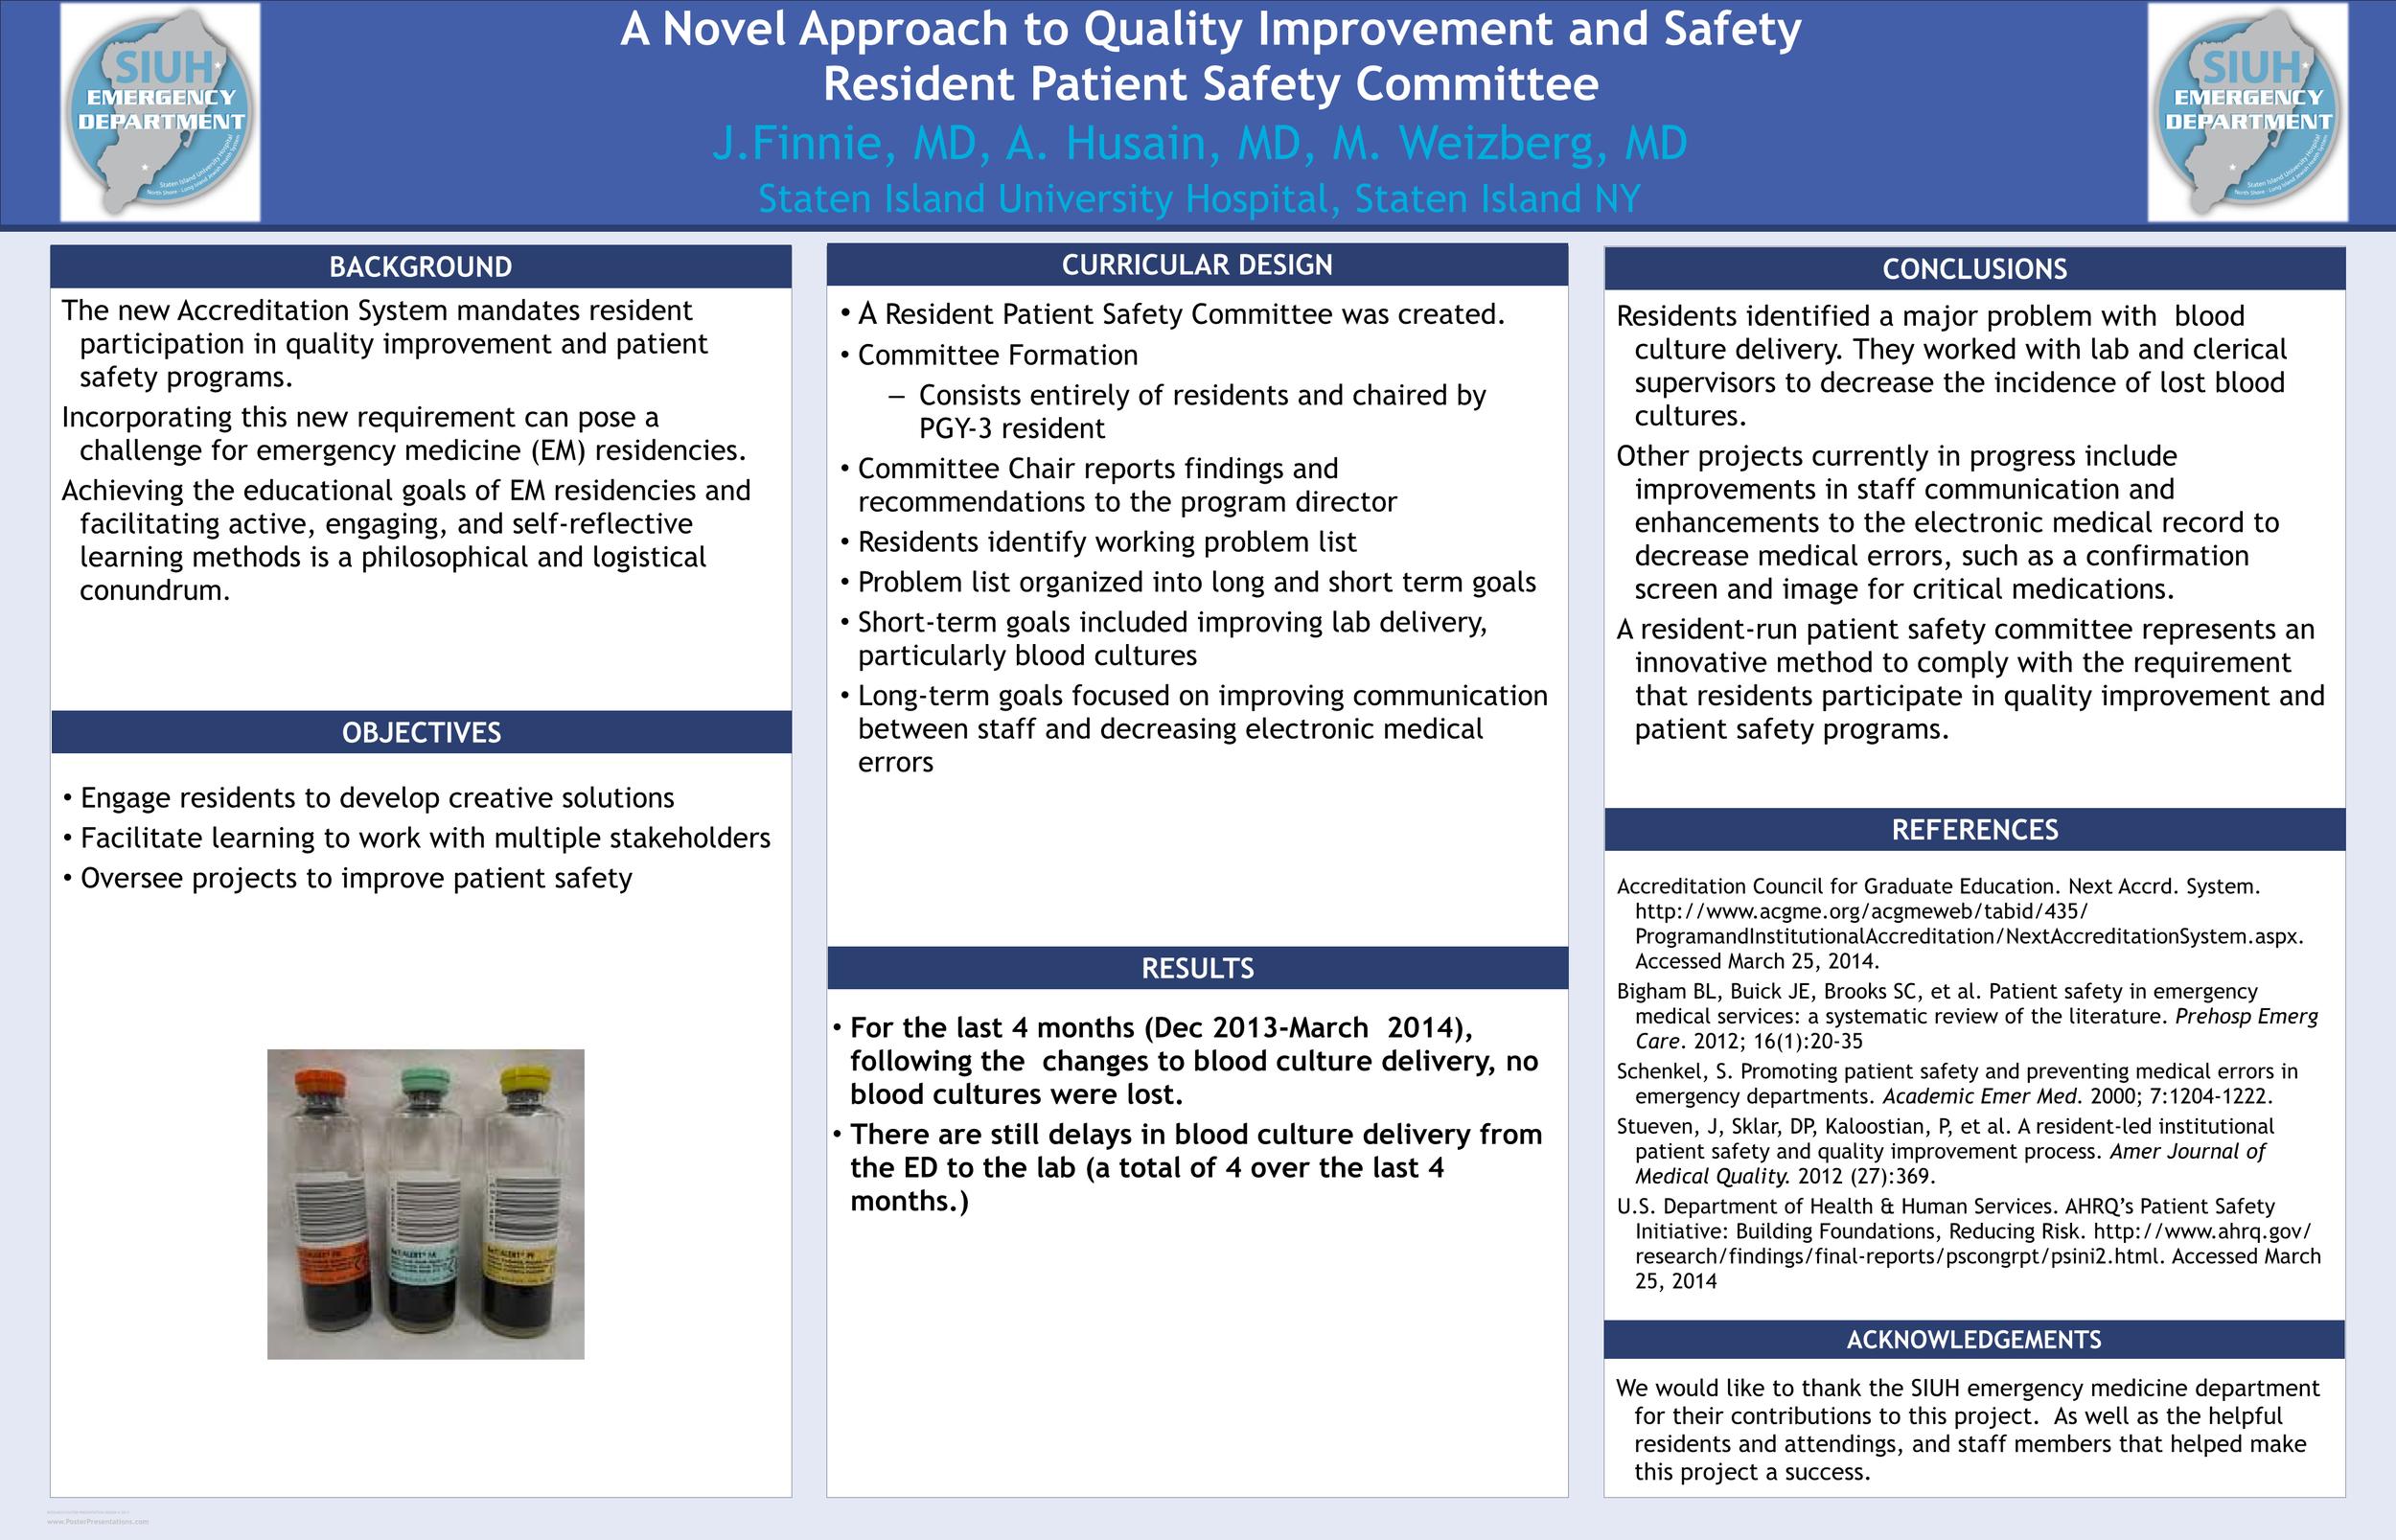 safetycommitee_Poster_2014 .001.jpg